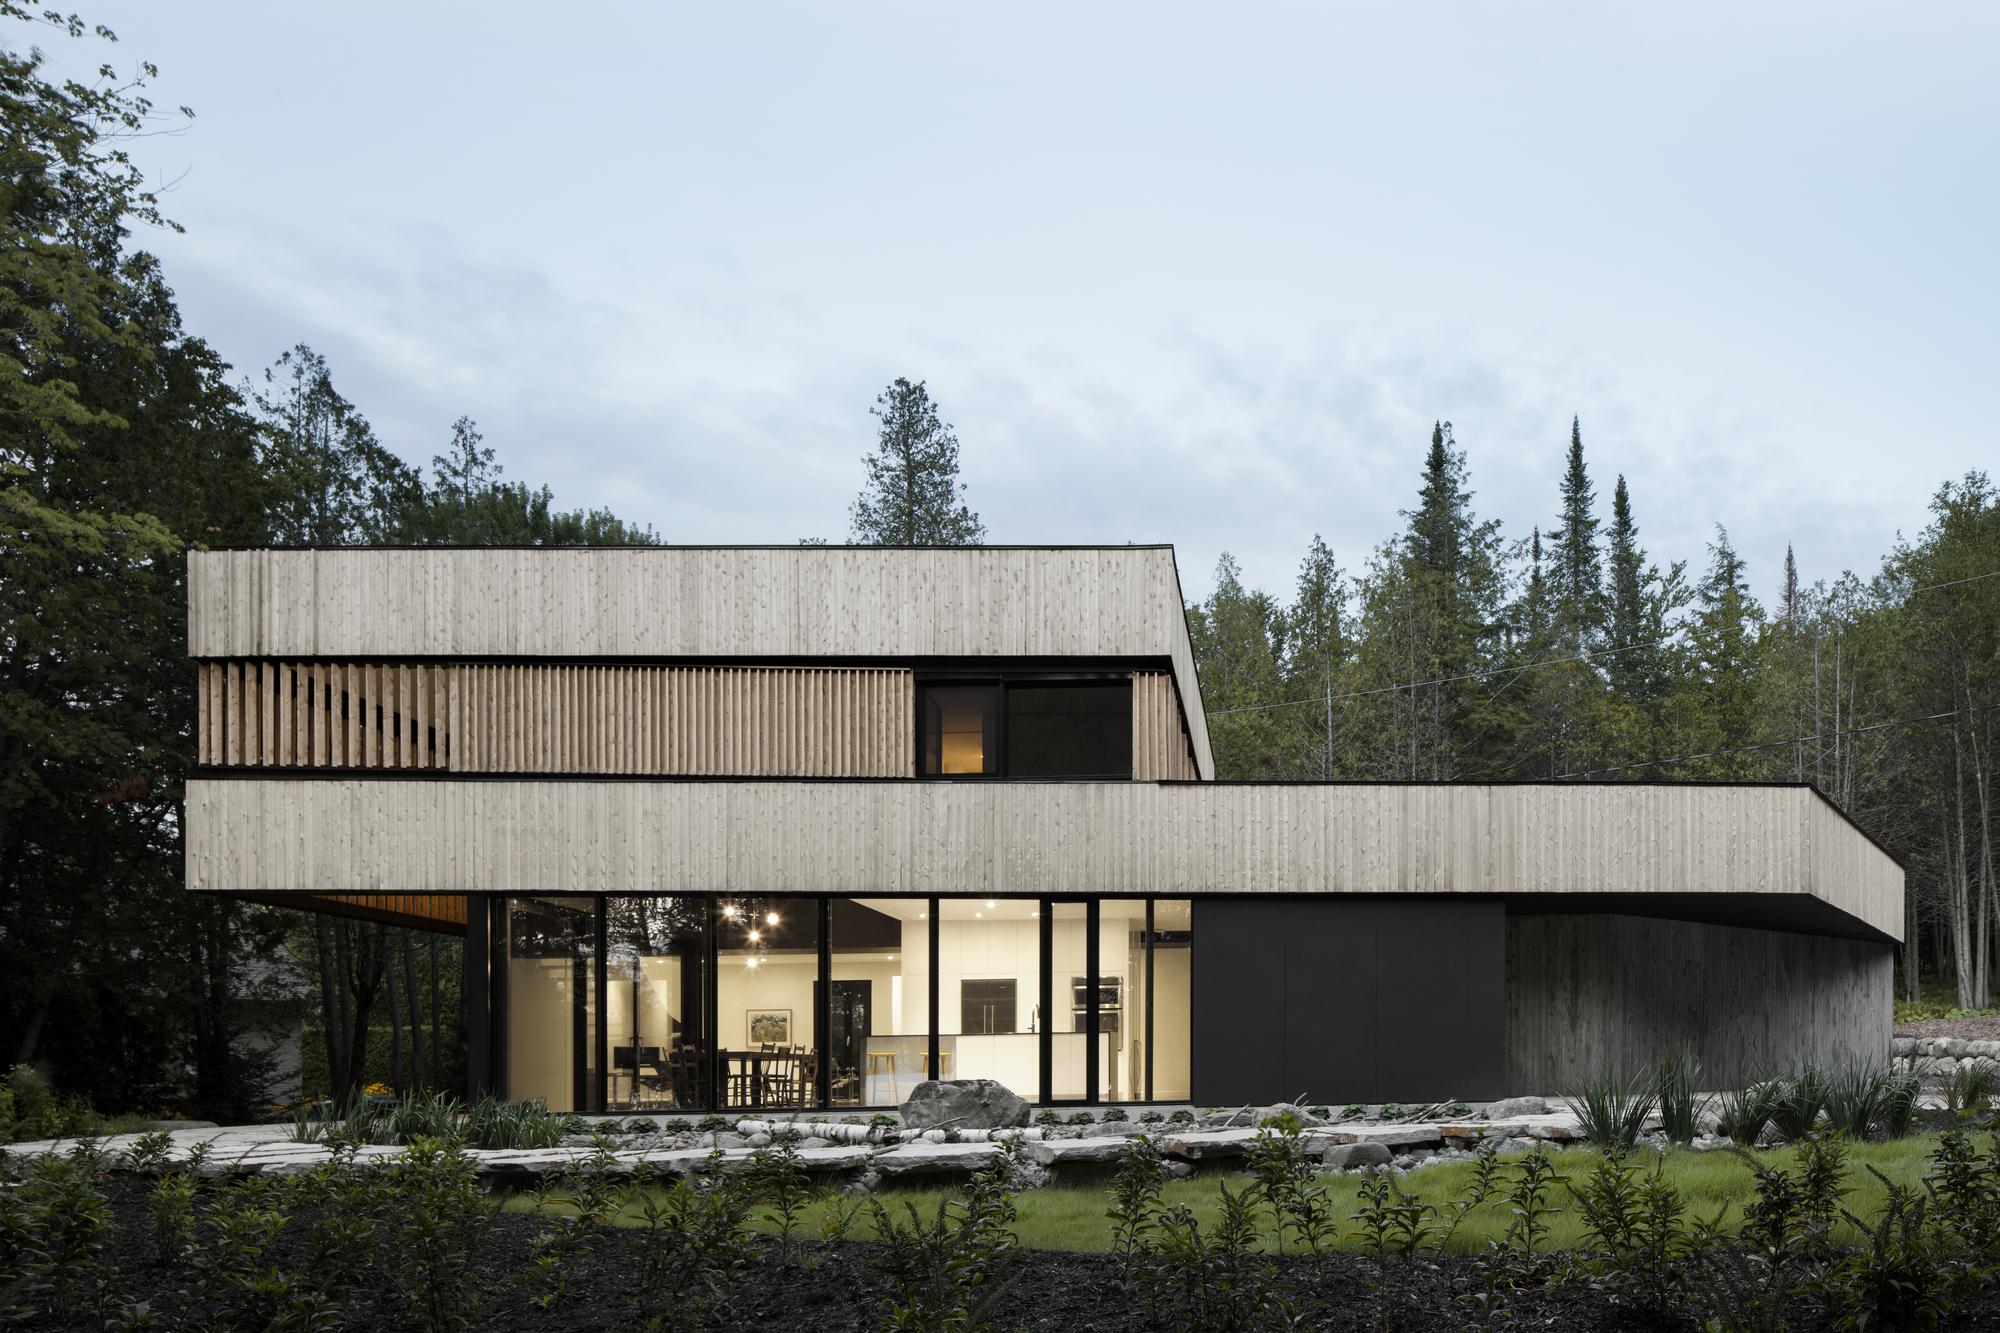 gallery of maison sur le lac acdf architecture 6. Black Bedroom Furniture Sets. Home Design Ideas